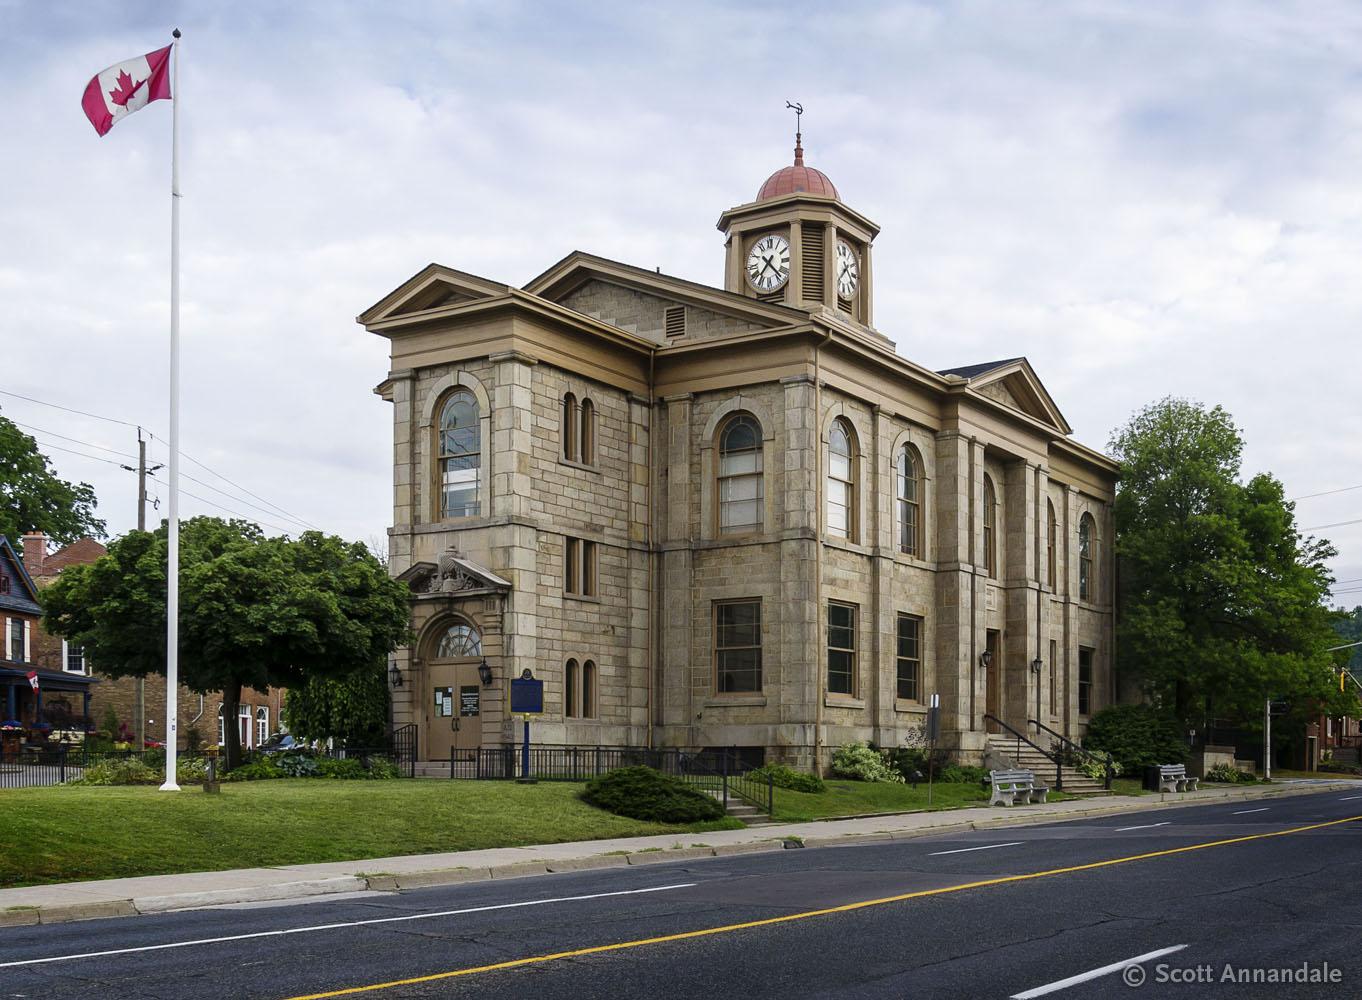 Dundas Town Hall